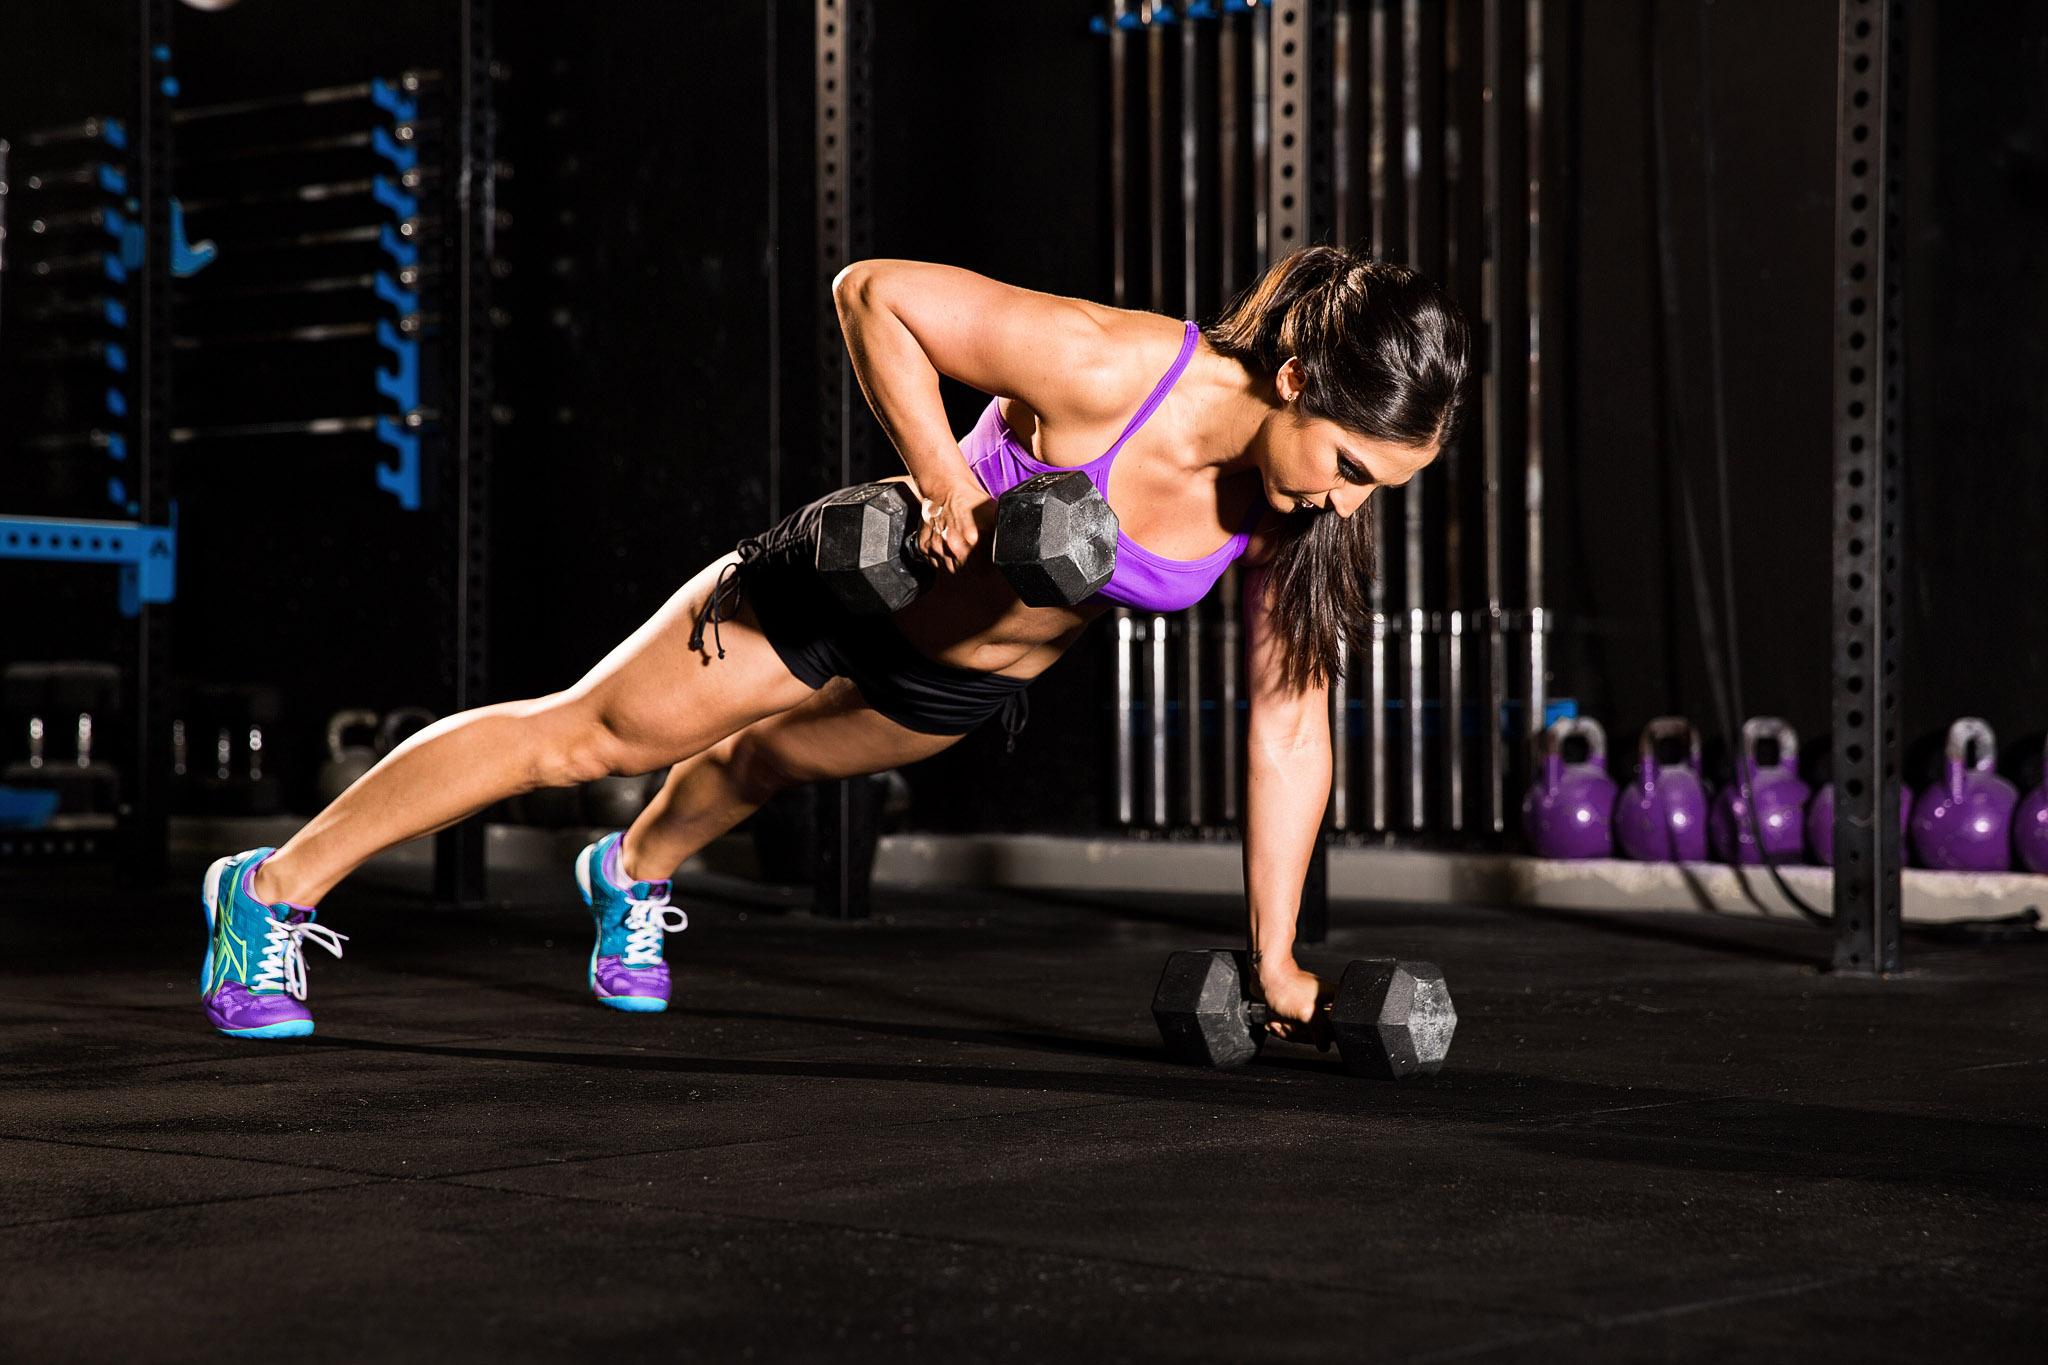 224 female fitness photoshoot crossfit biceps